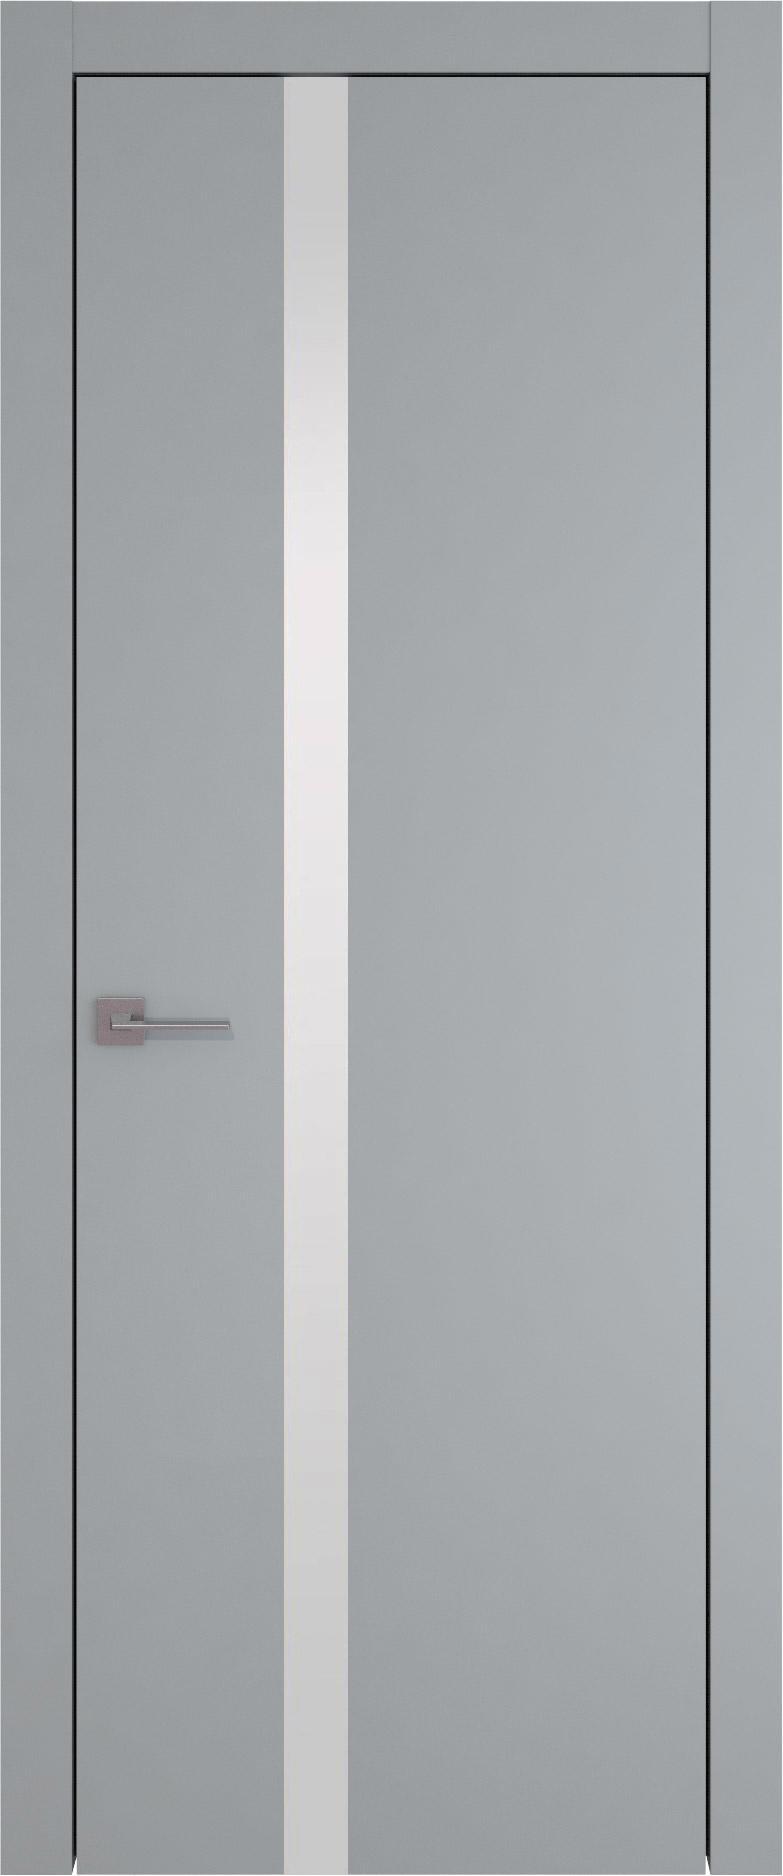 Tivoli Д-1 цвет - Серебристо-серая эмаль (RAL 7045) Без стекла (ДГ)